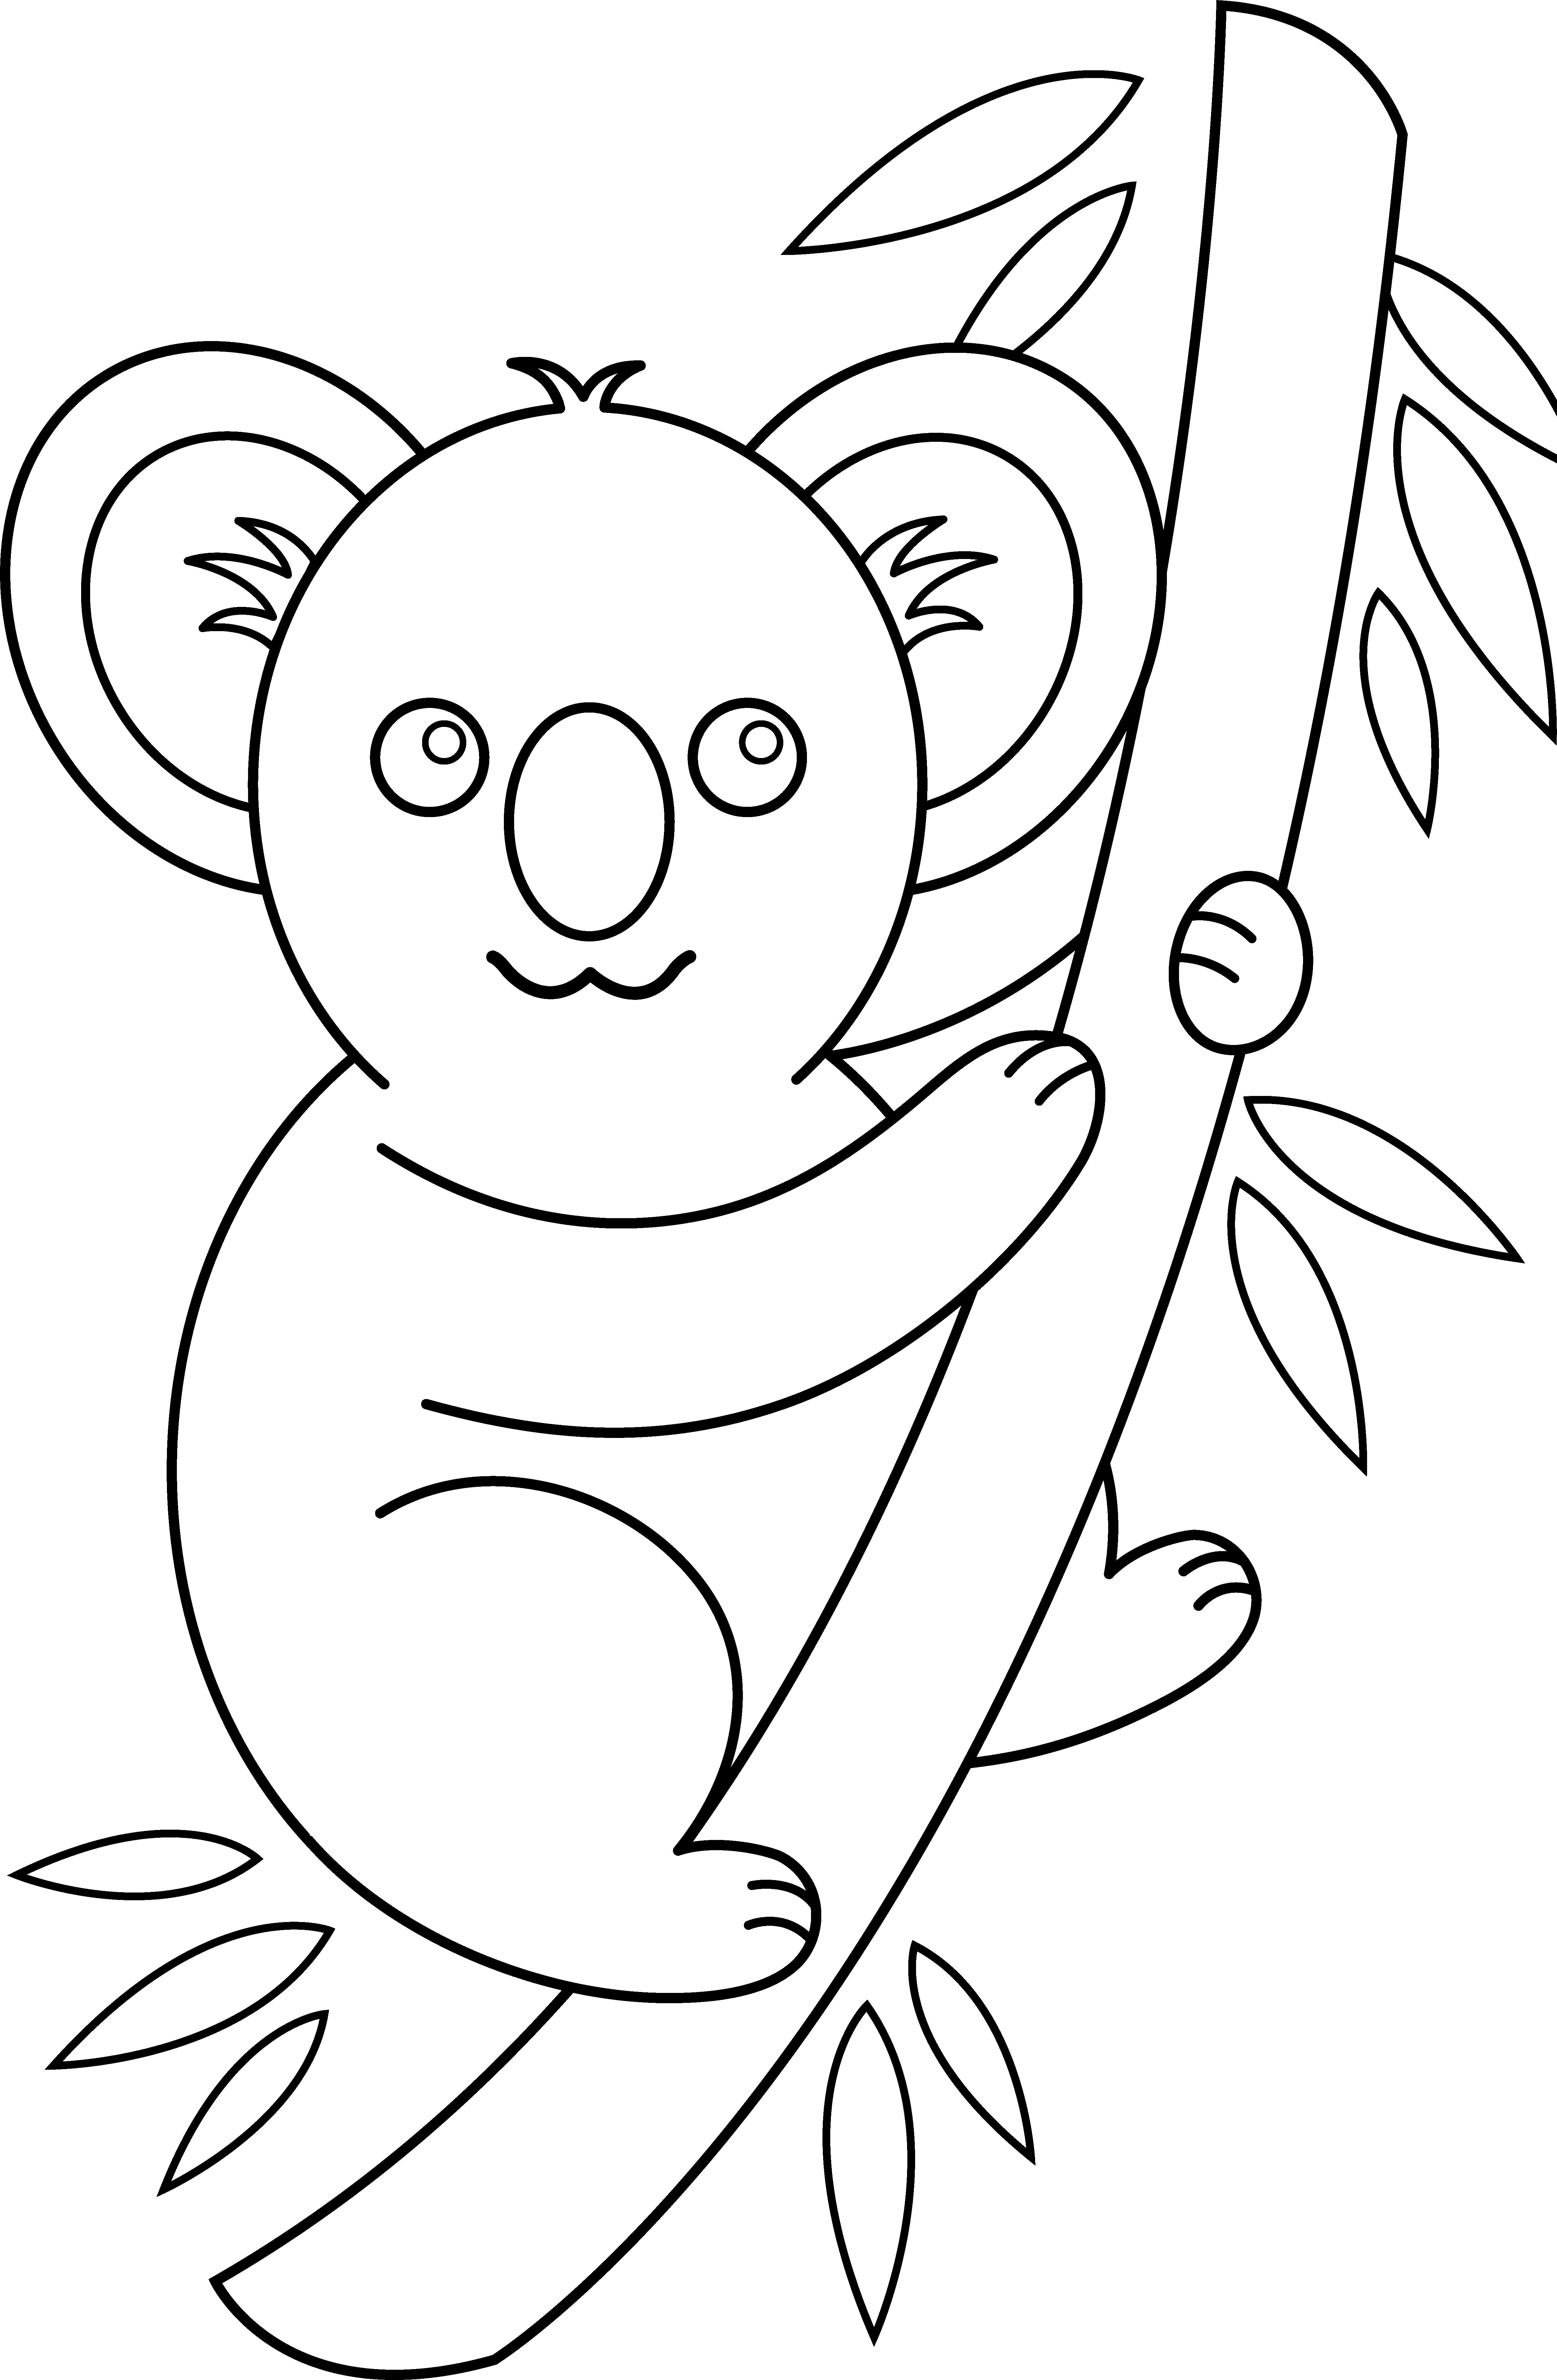 Line Drawings Of Australian Animals : Cartoon koala pictures cliparts